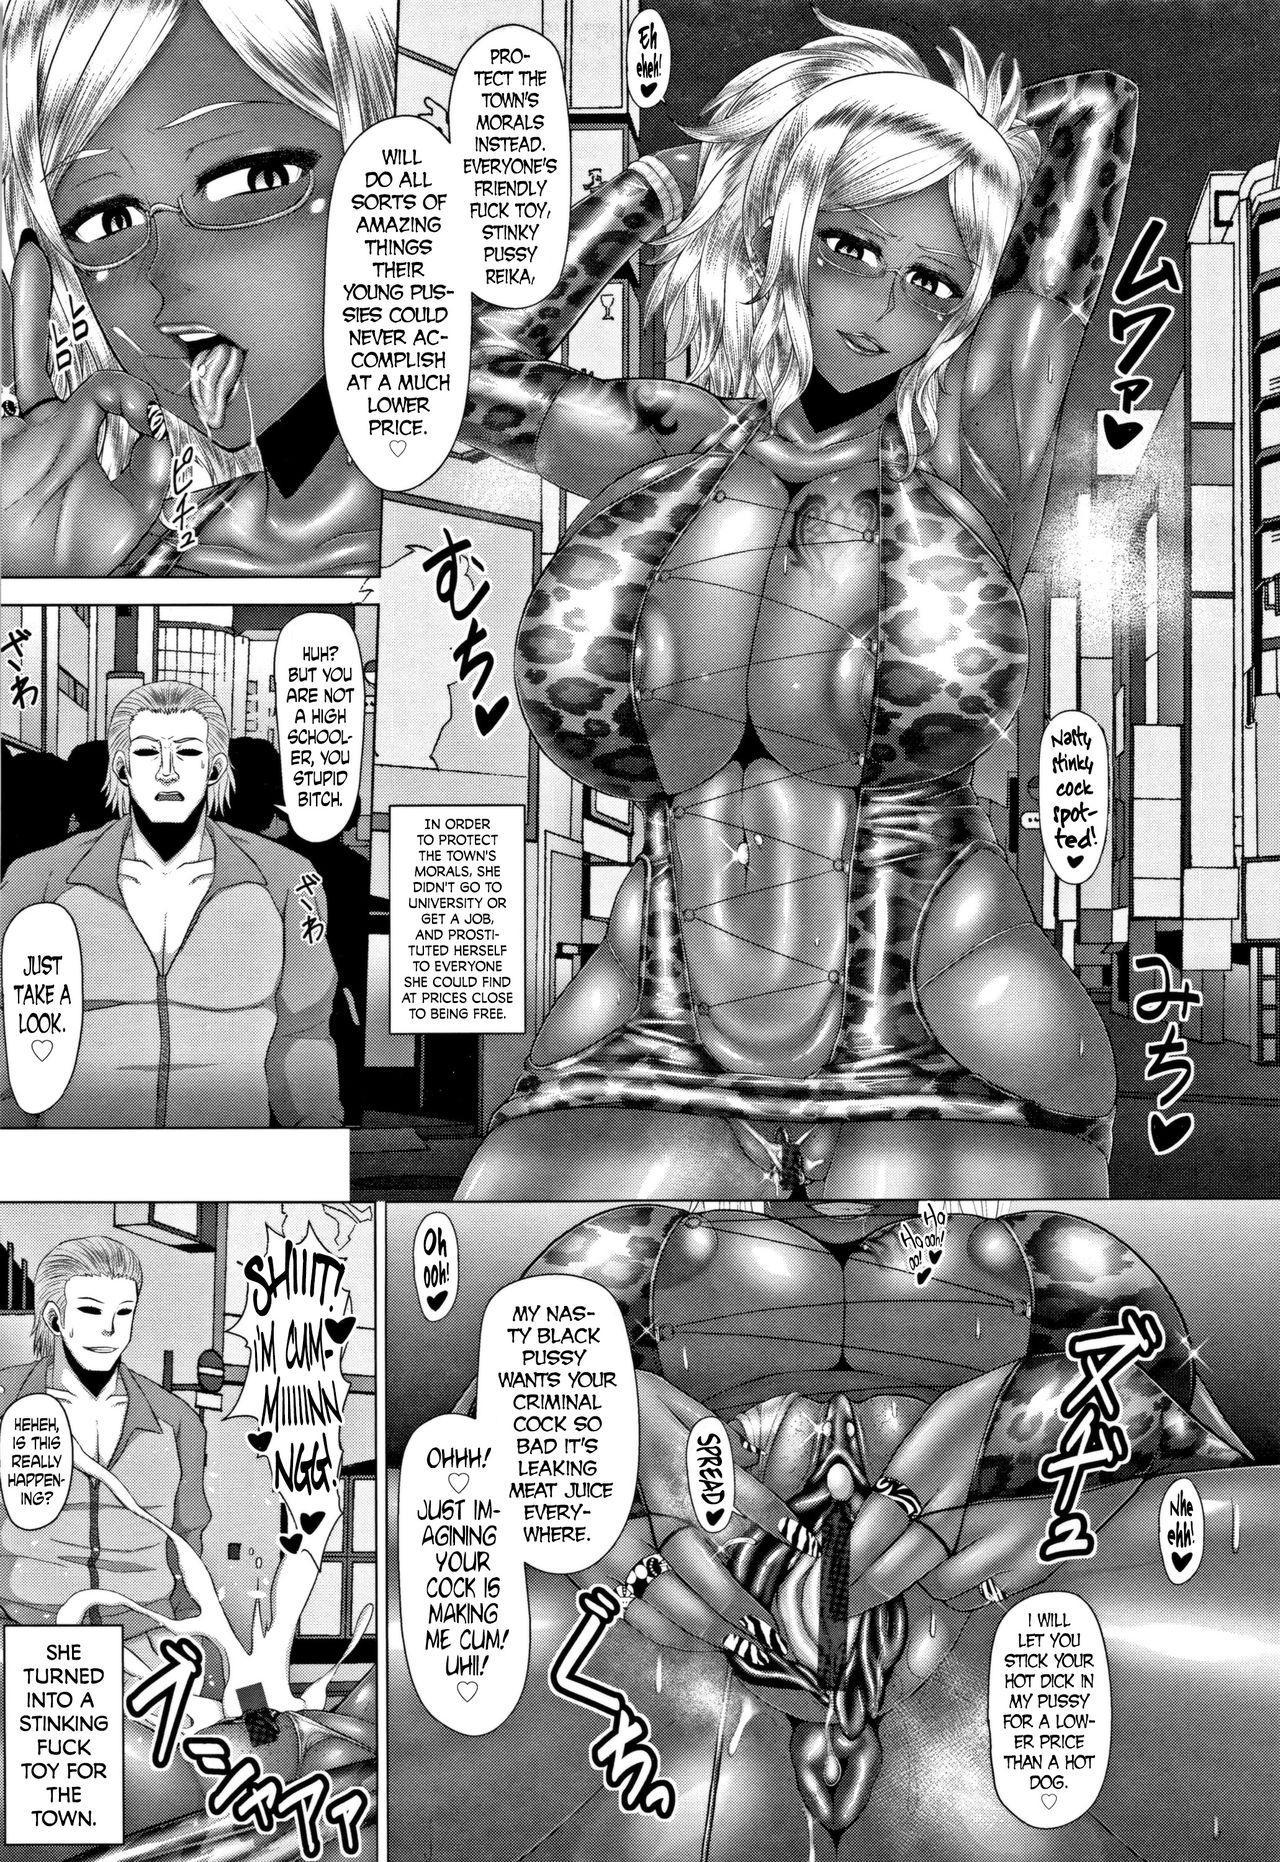 [Inoue Nanaki] Joushiki Daha! Kuro Gal Bitch-ka Seikatsu Ch. 1-3, 5-8 [English] [Dark Mac + N04h] 140